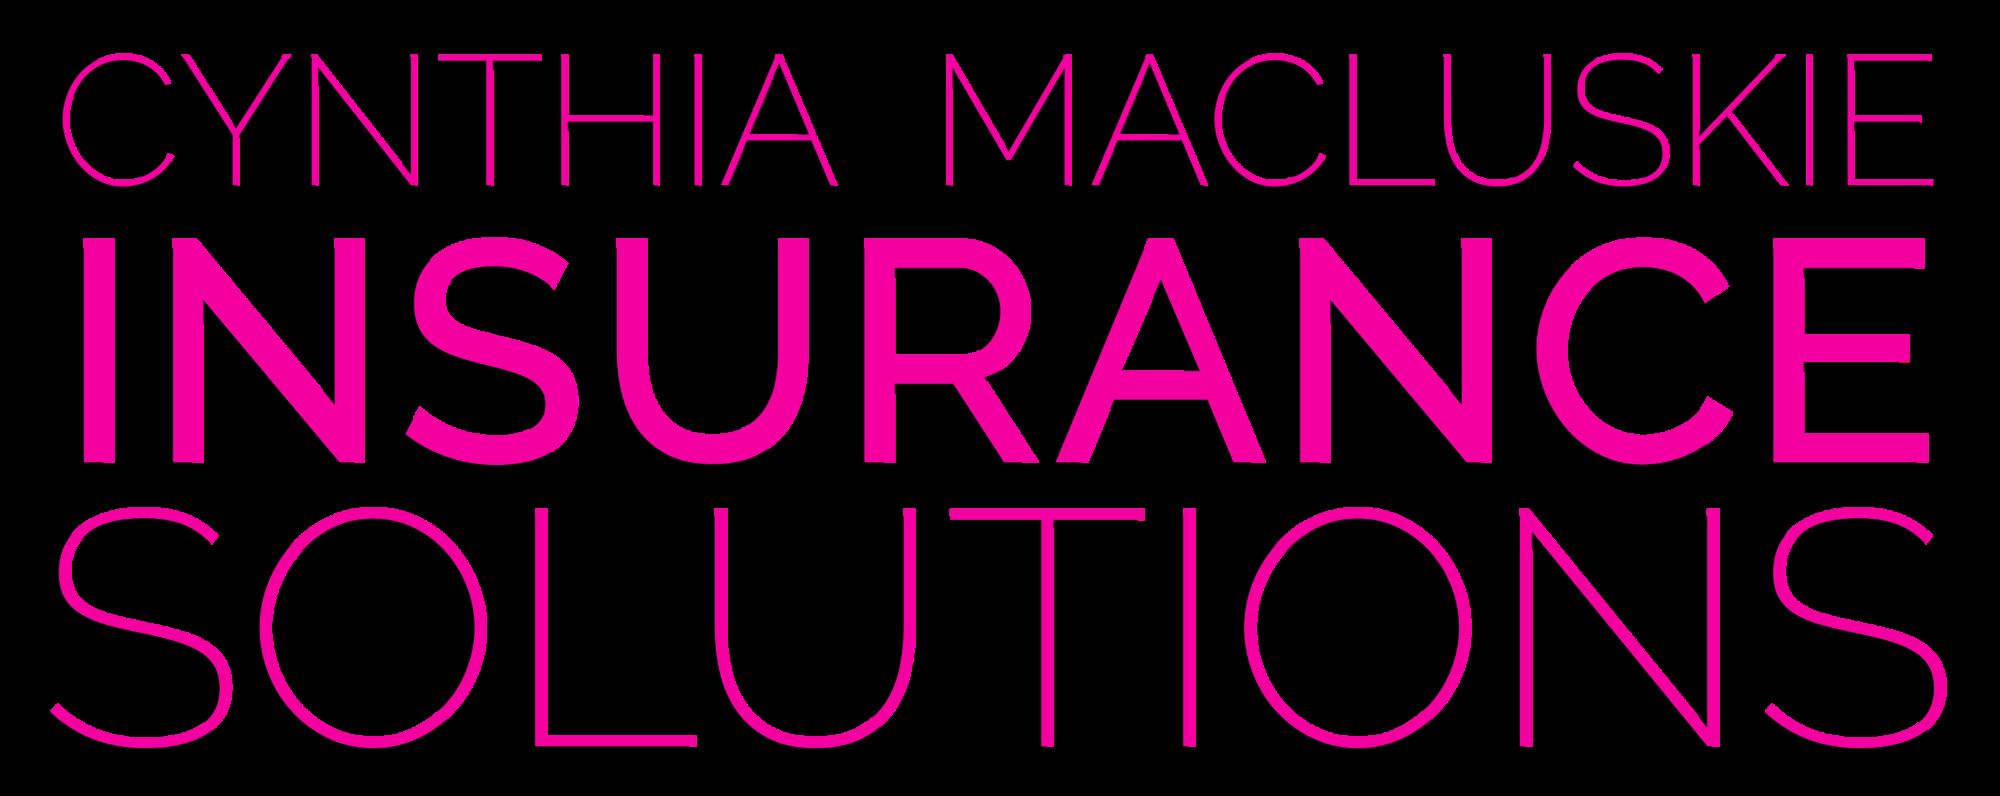 Cynthia Macluskie Insurance Solutions